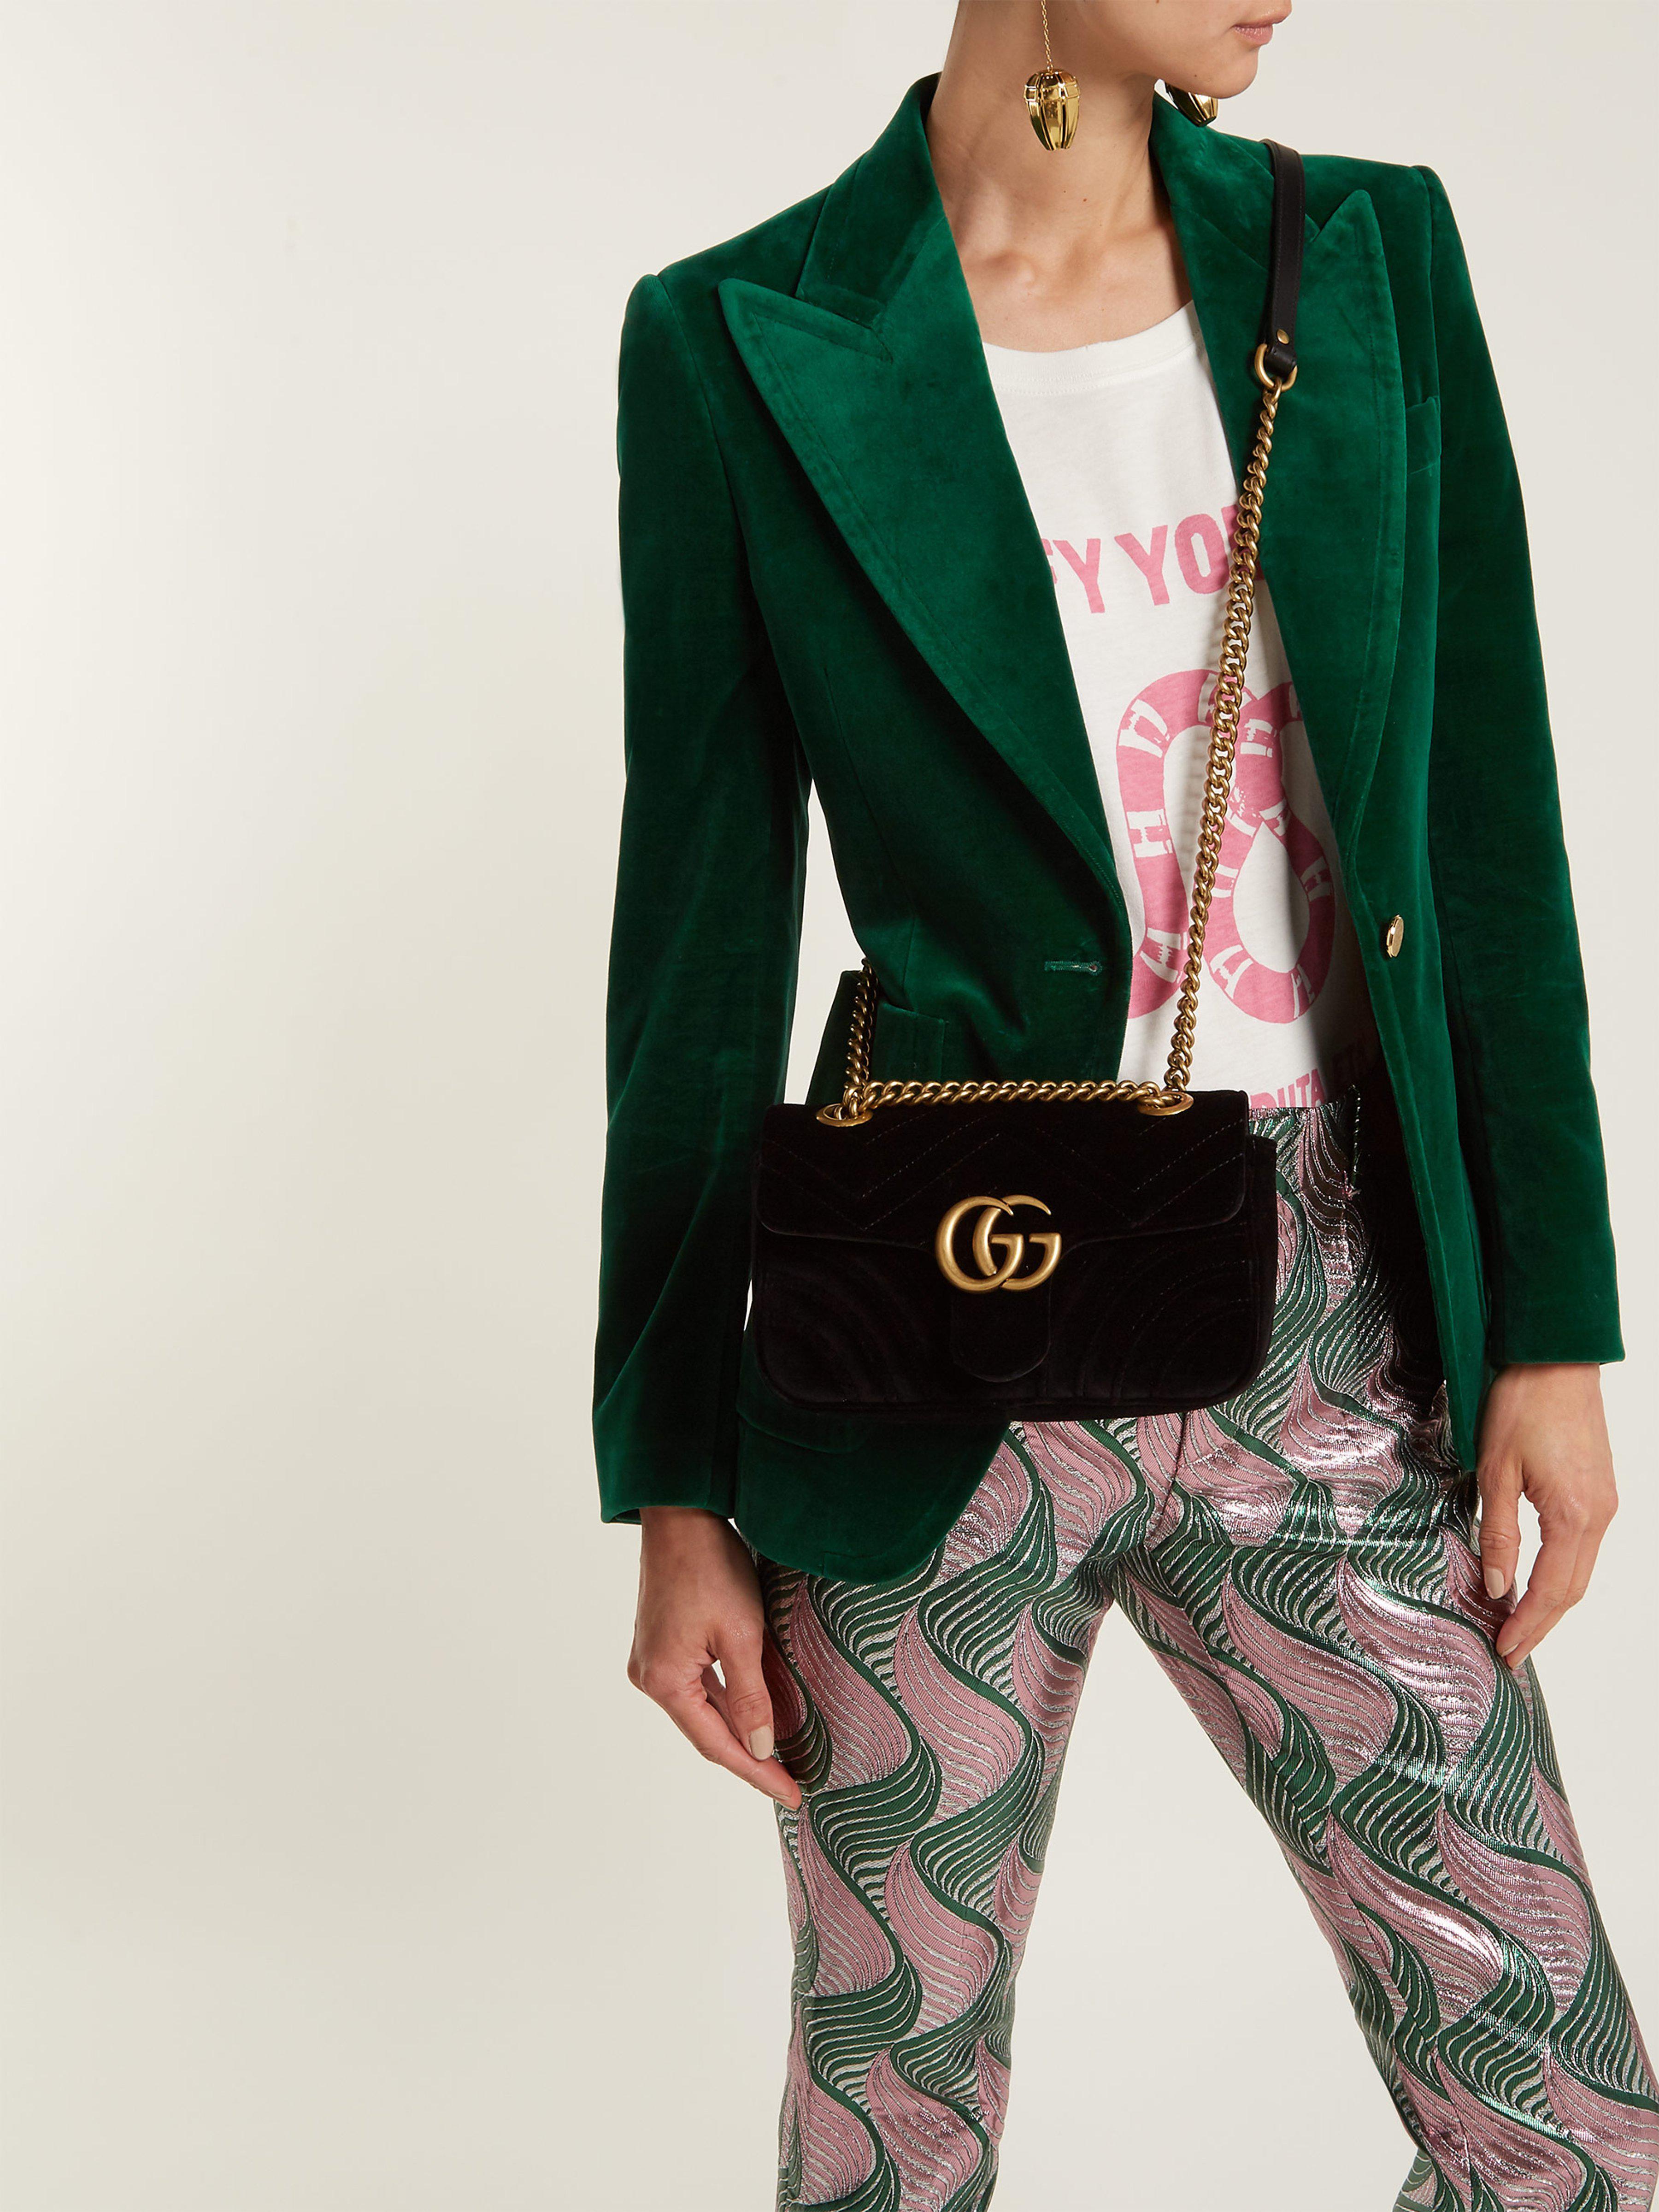 386f6abad91 Gucci Gg Marmont Mini Velvet Quilted Shoulder Bag in Black - Lyst